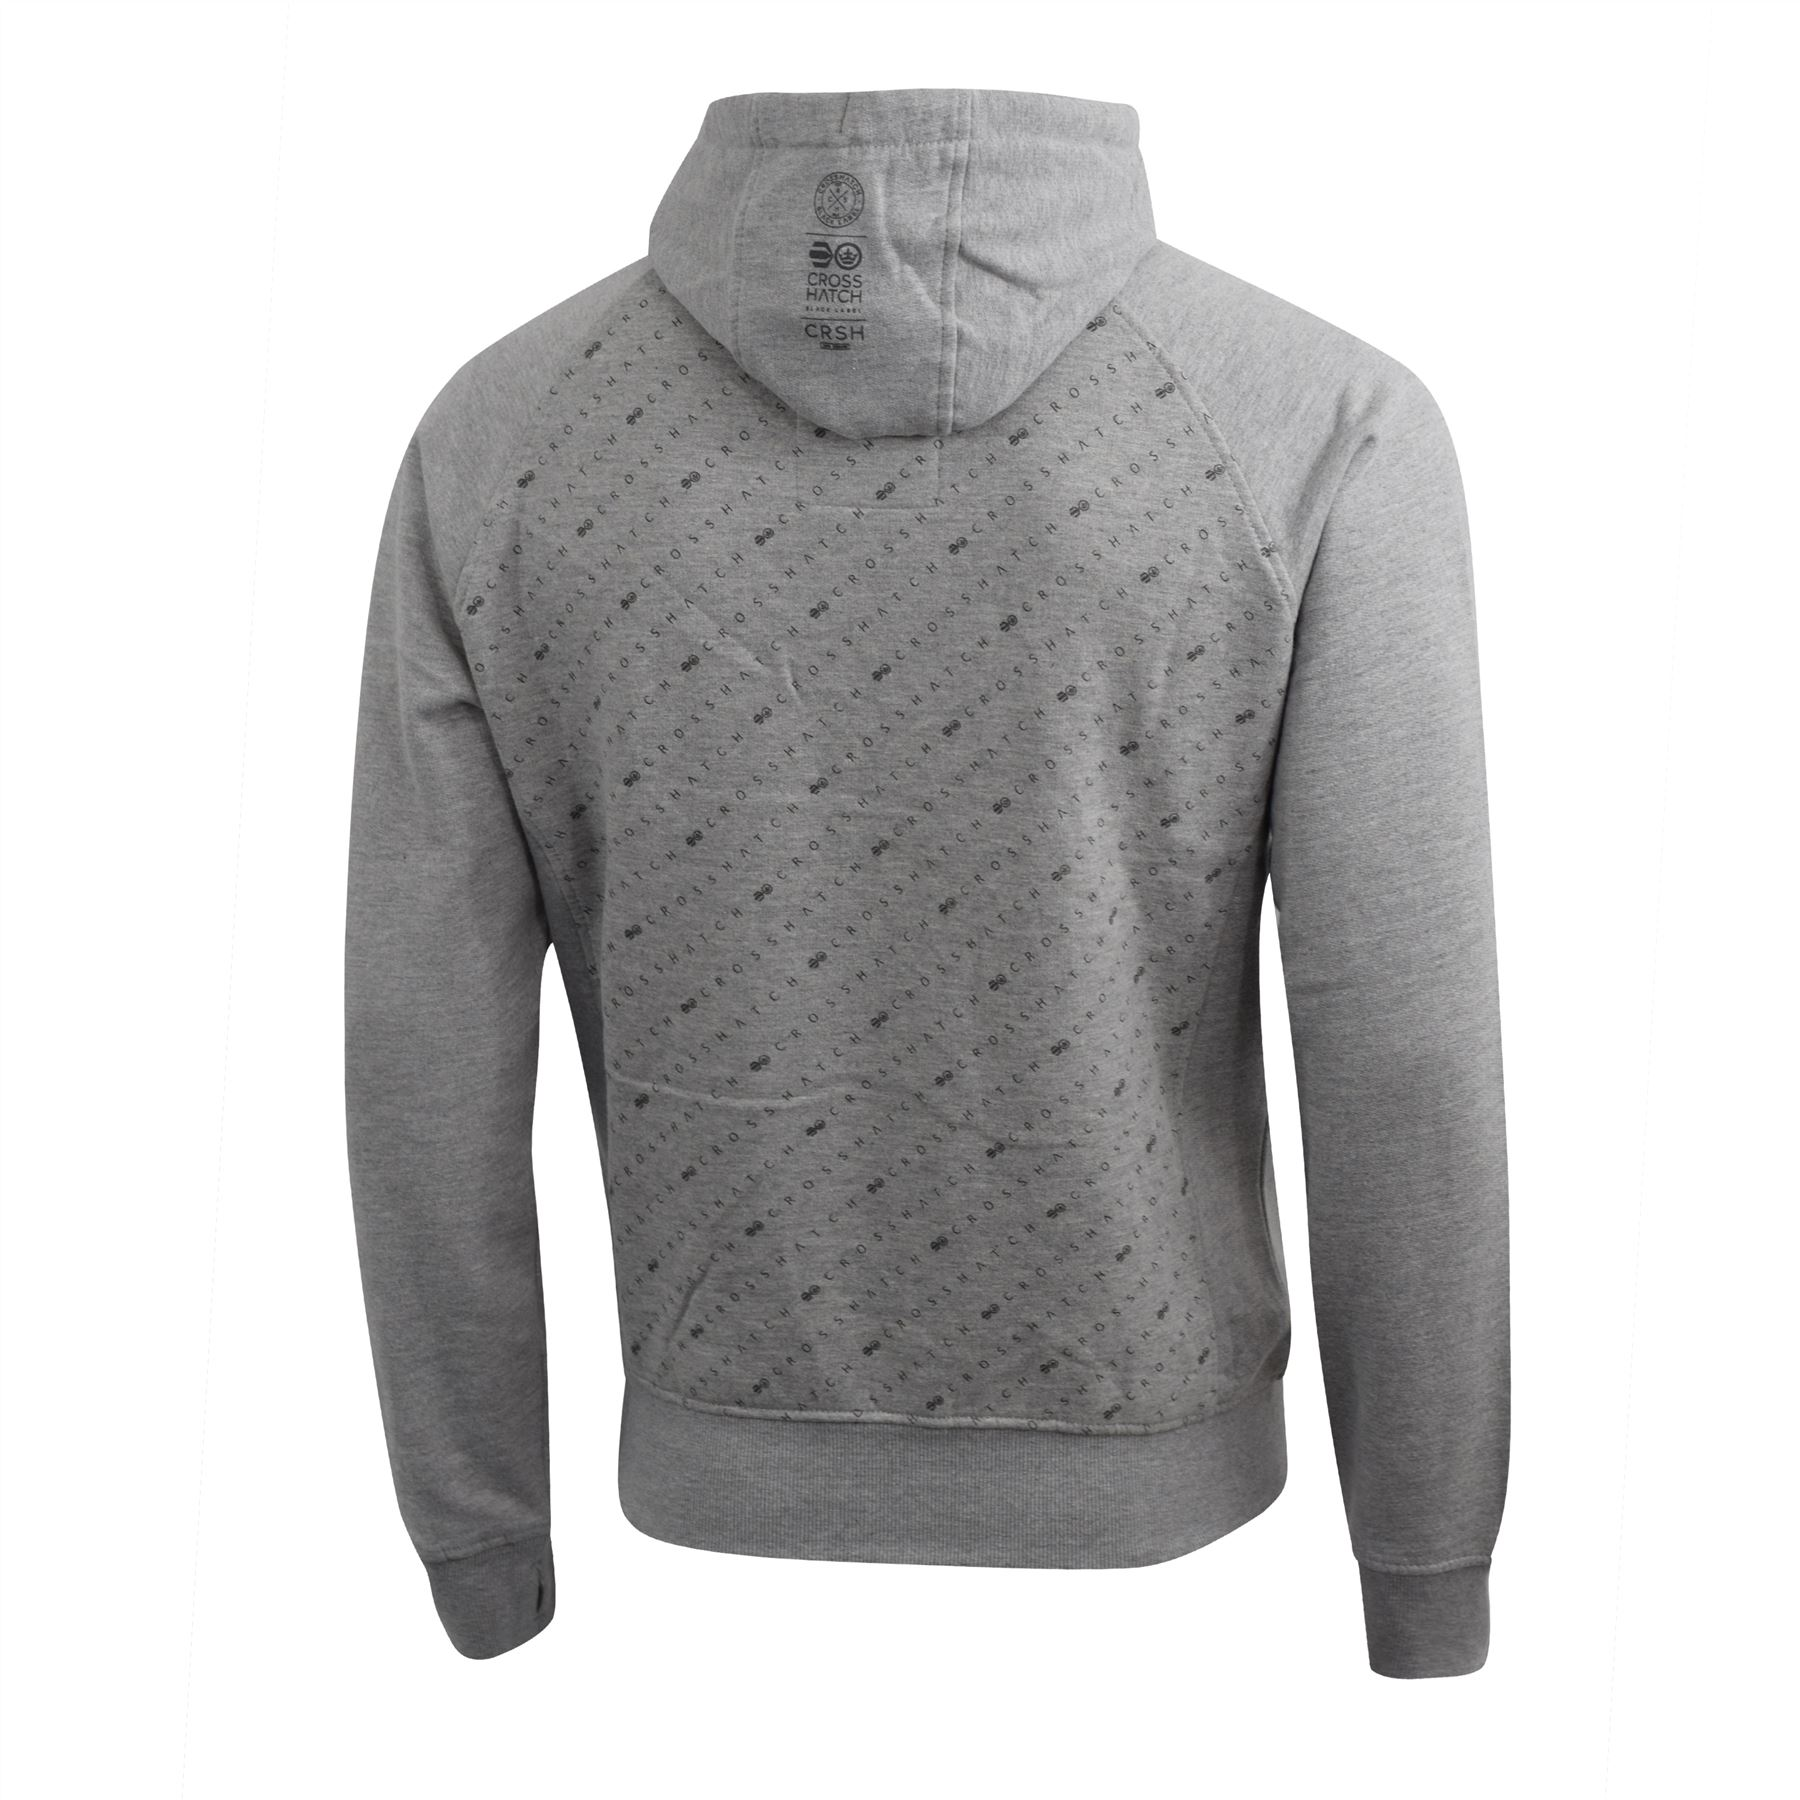 Mens-Hoodie-Crosshatch-Pullover-Degas-Hooded-Sweater-Jumper thumbnail 10